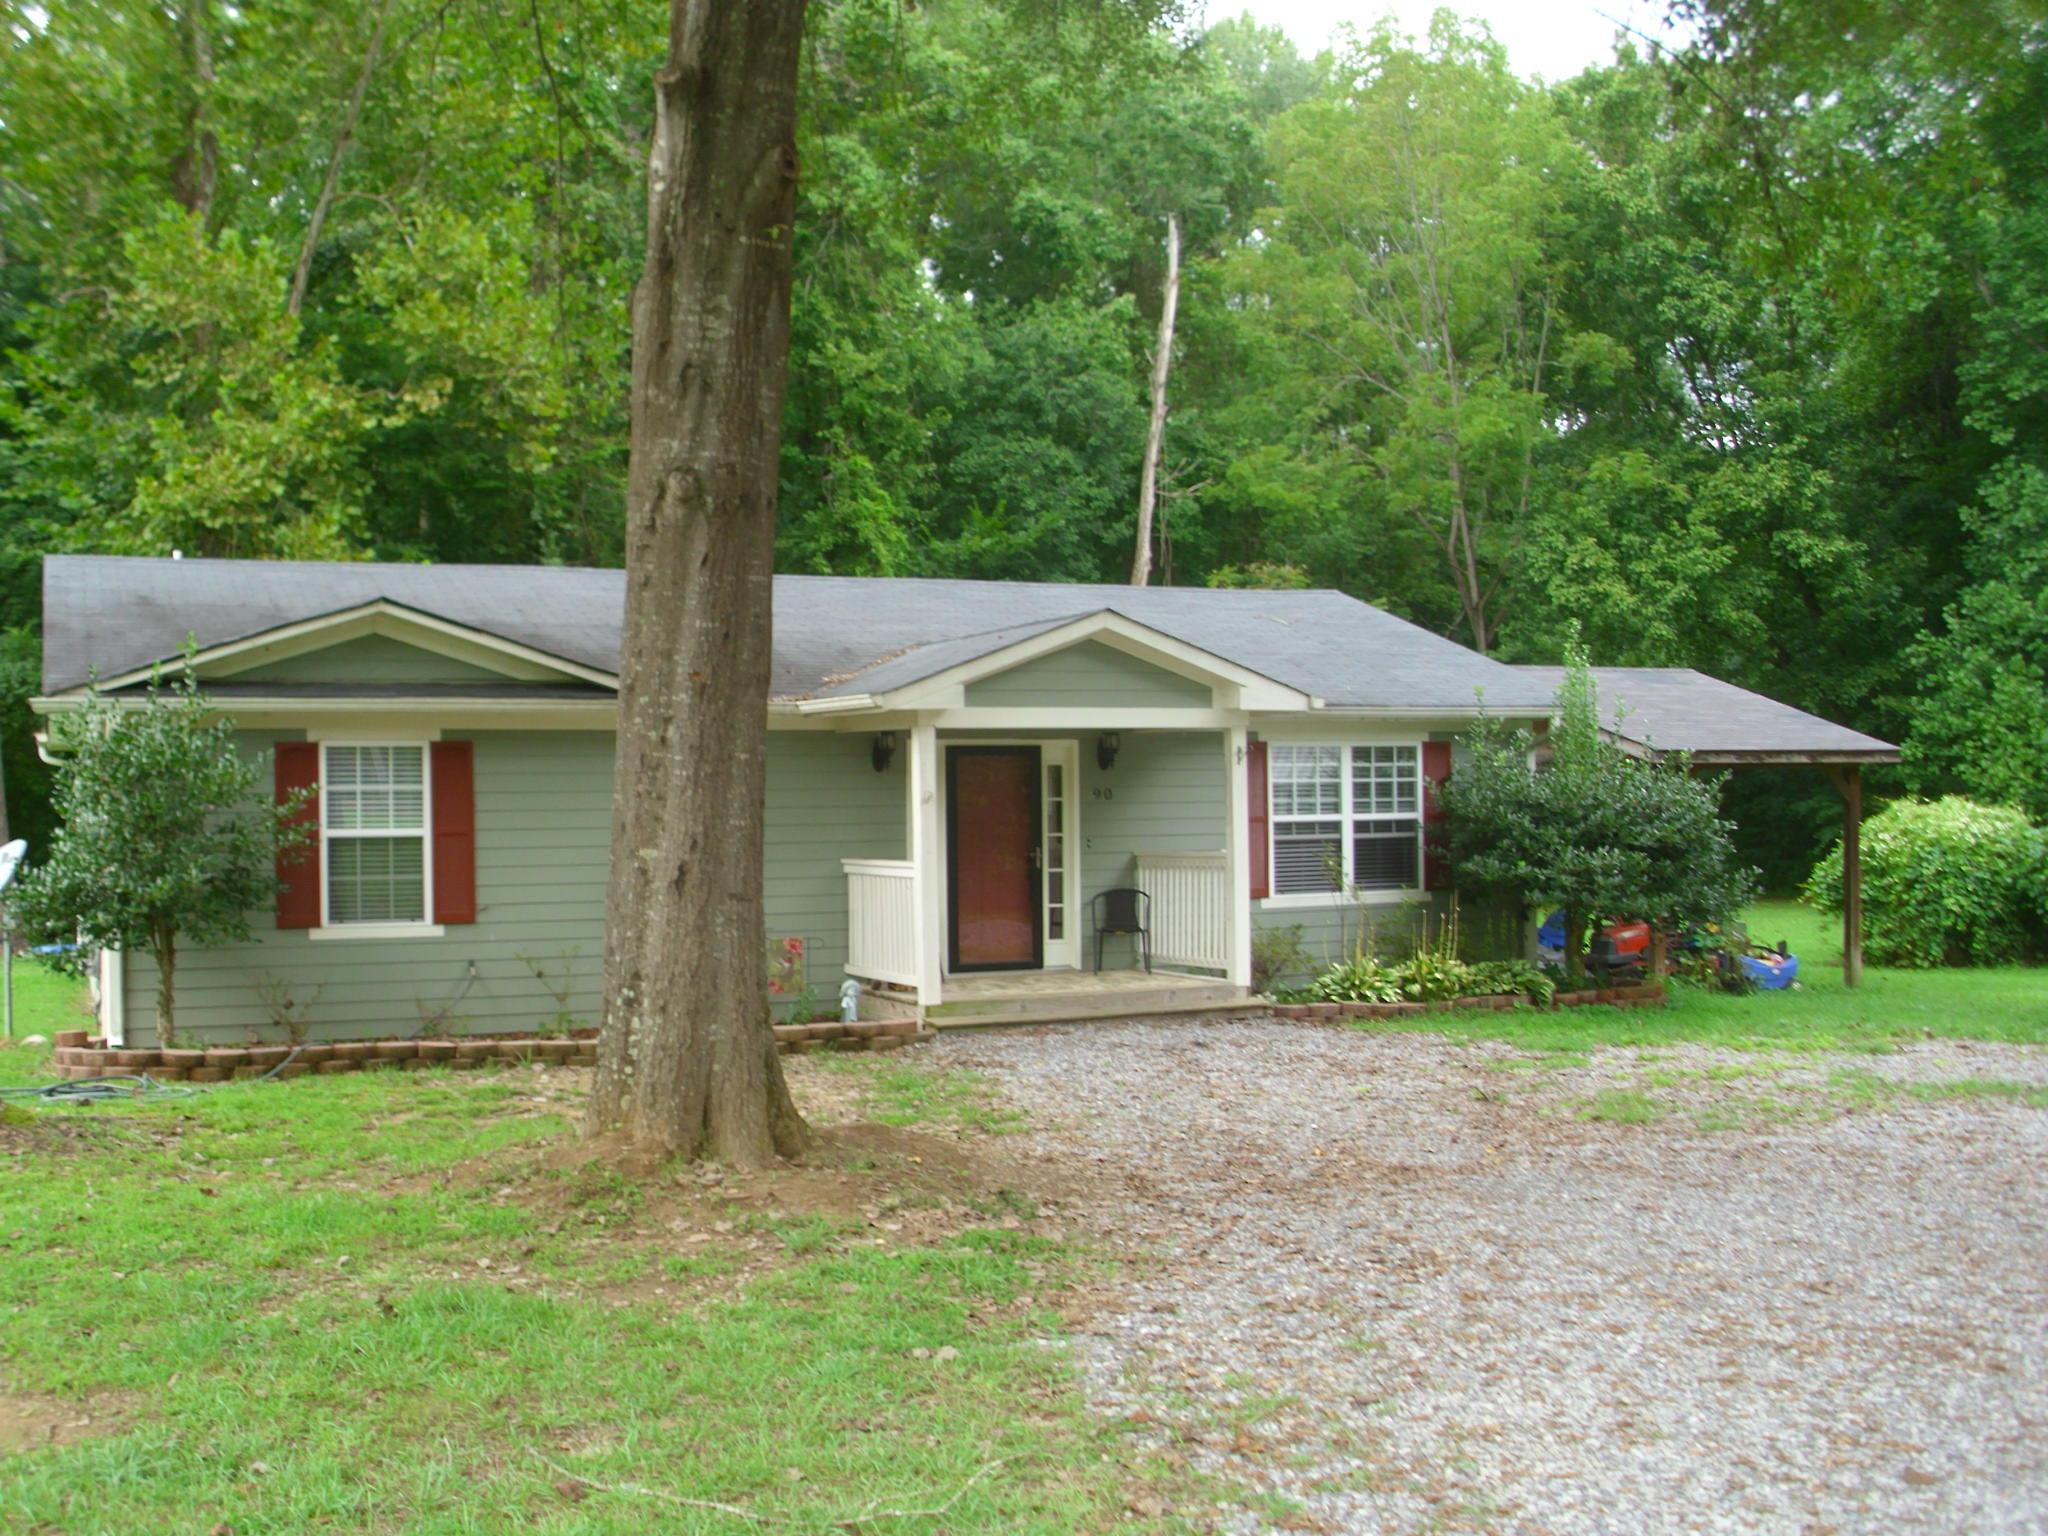 90 MALIBU CIRCLE, Scottsboro, Alabama 35769